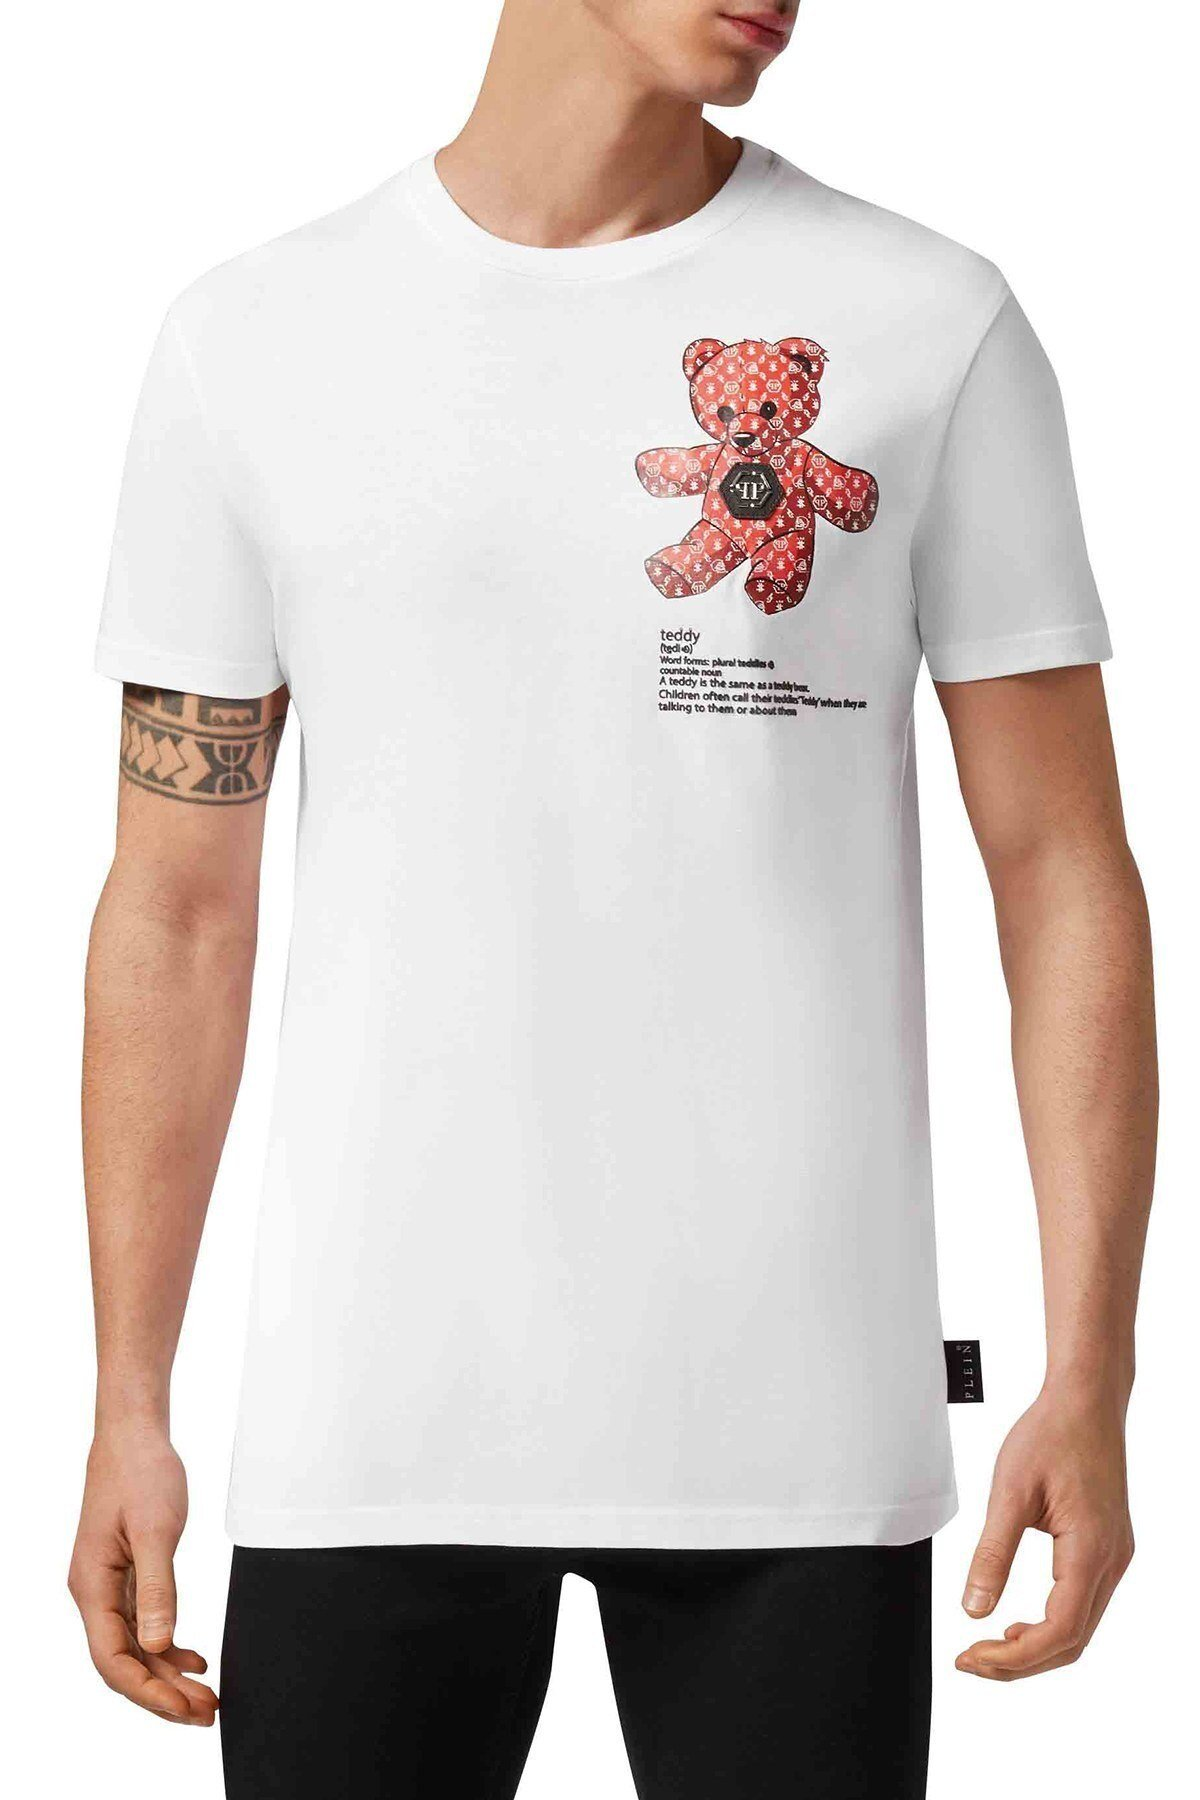 Philipp Plein Baskılı % 100 Pamuklu Erkek T Shirt F20C MTK4583 PJY002N 01 BEYAZ